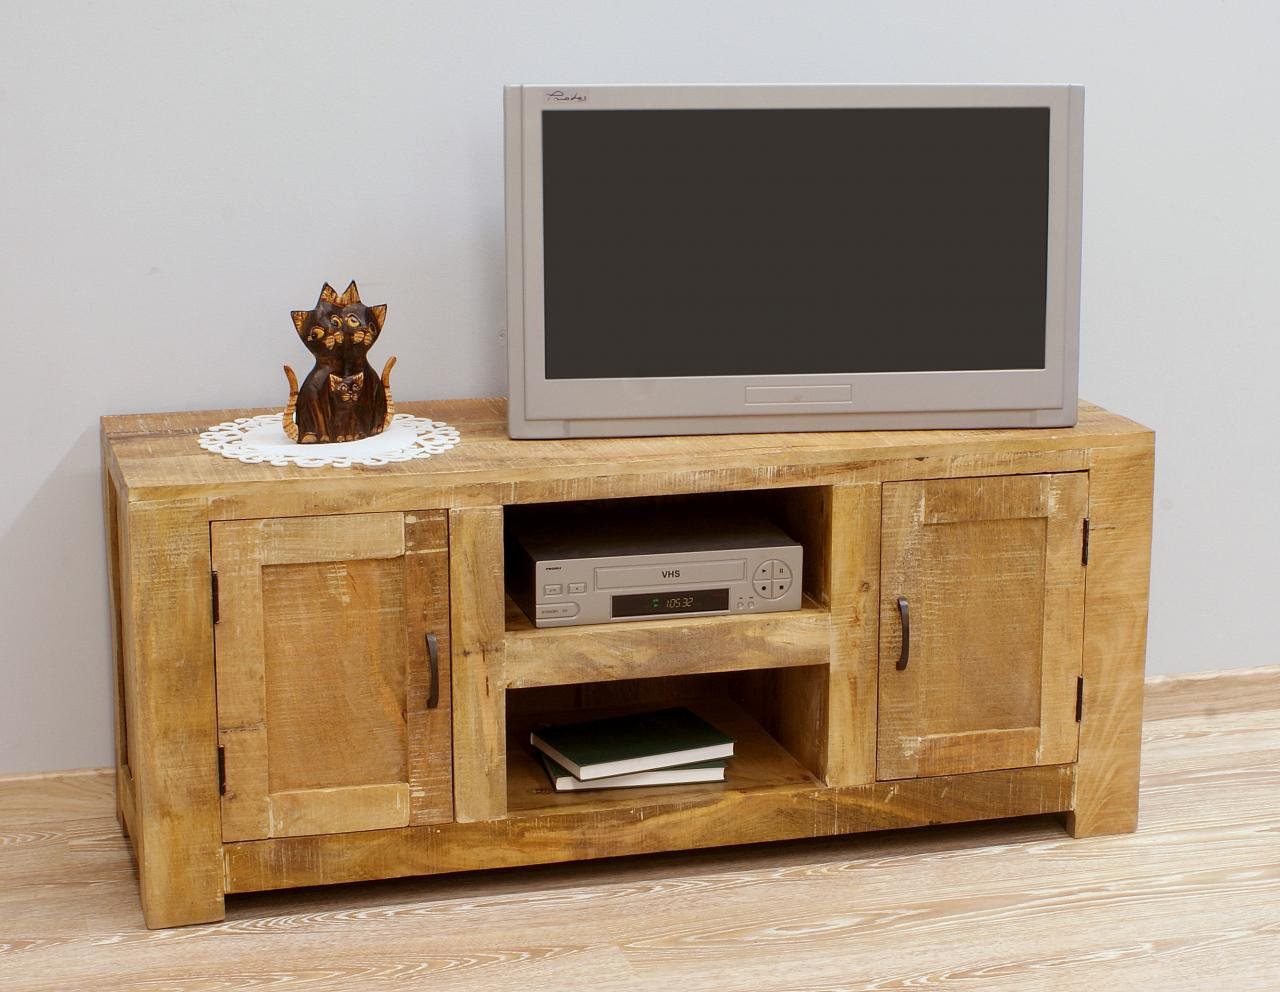 Komoda RTV kolonialna lite drewno mango styl Loft minimalistyczna